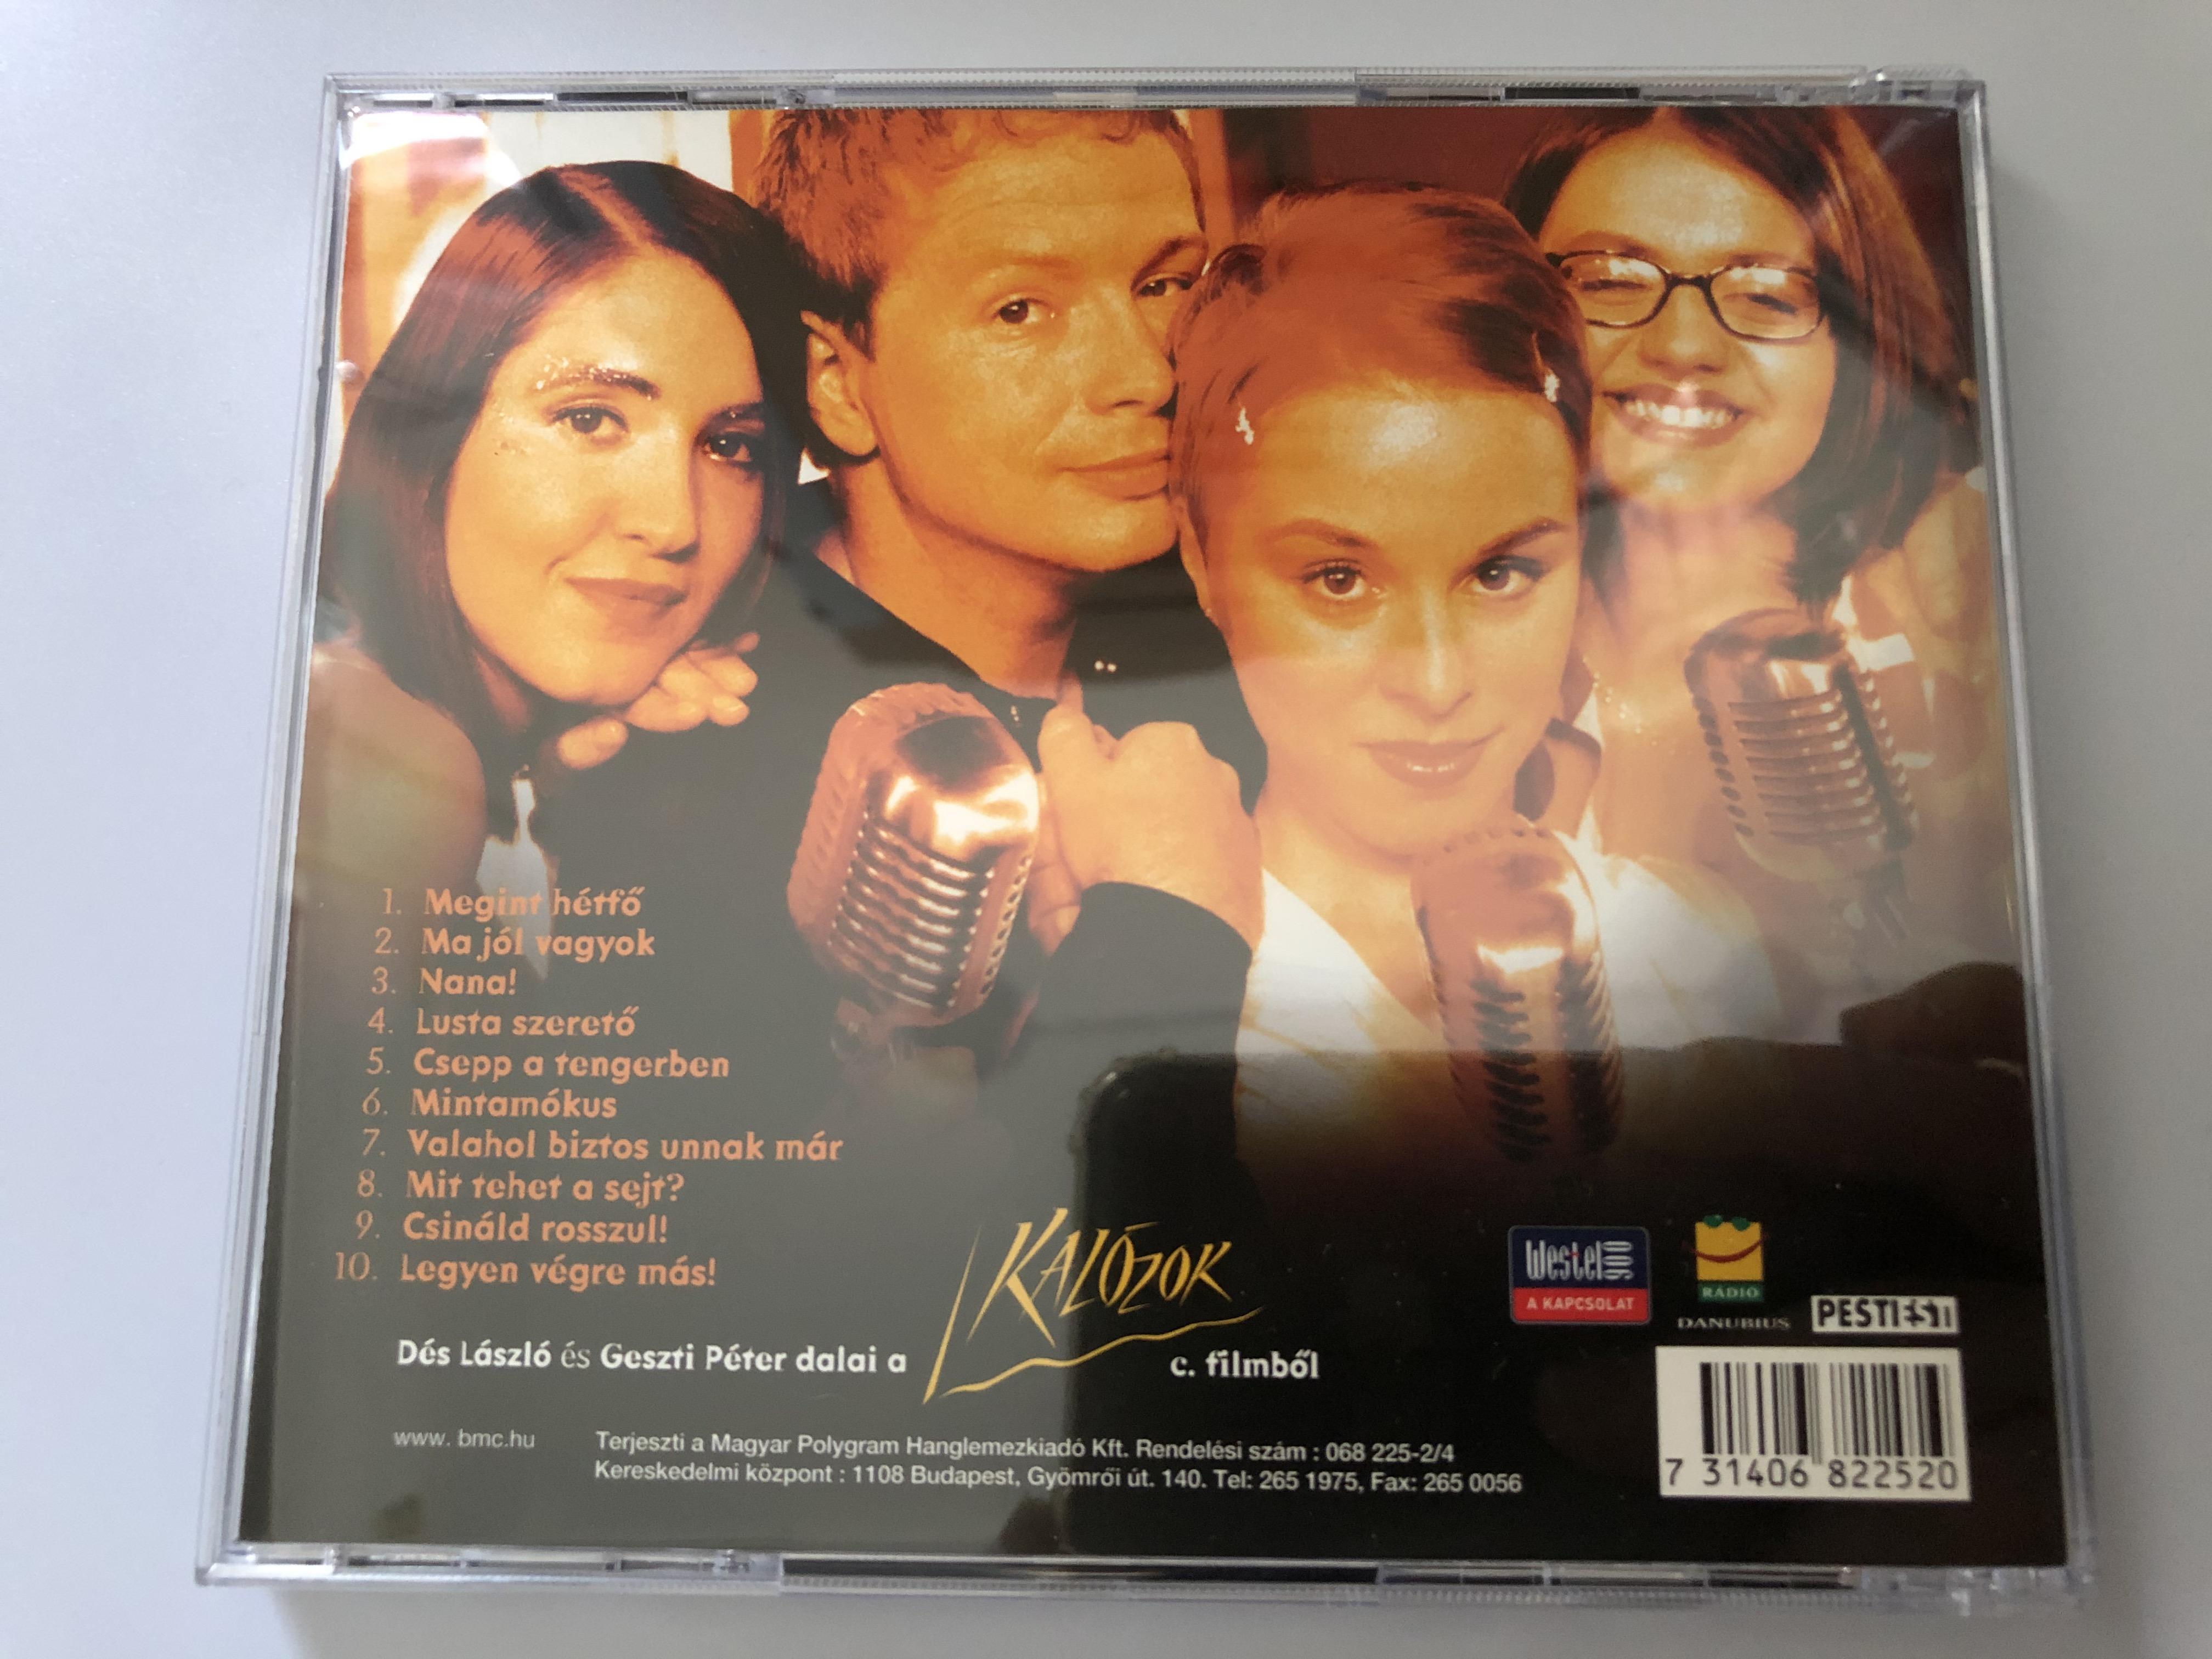 d-s-geszti-jazz-az-kal-zok-budapest-music-center-records-audio-cd-1998-bmc-cd-016-10-.jpg